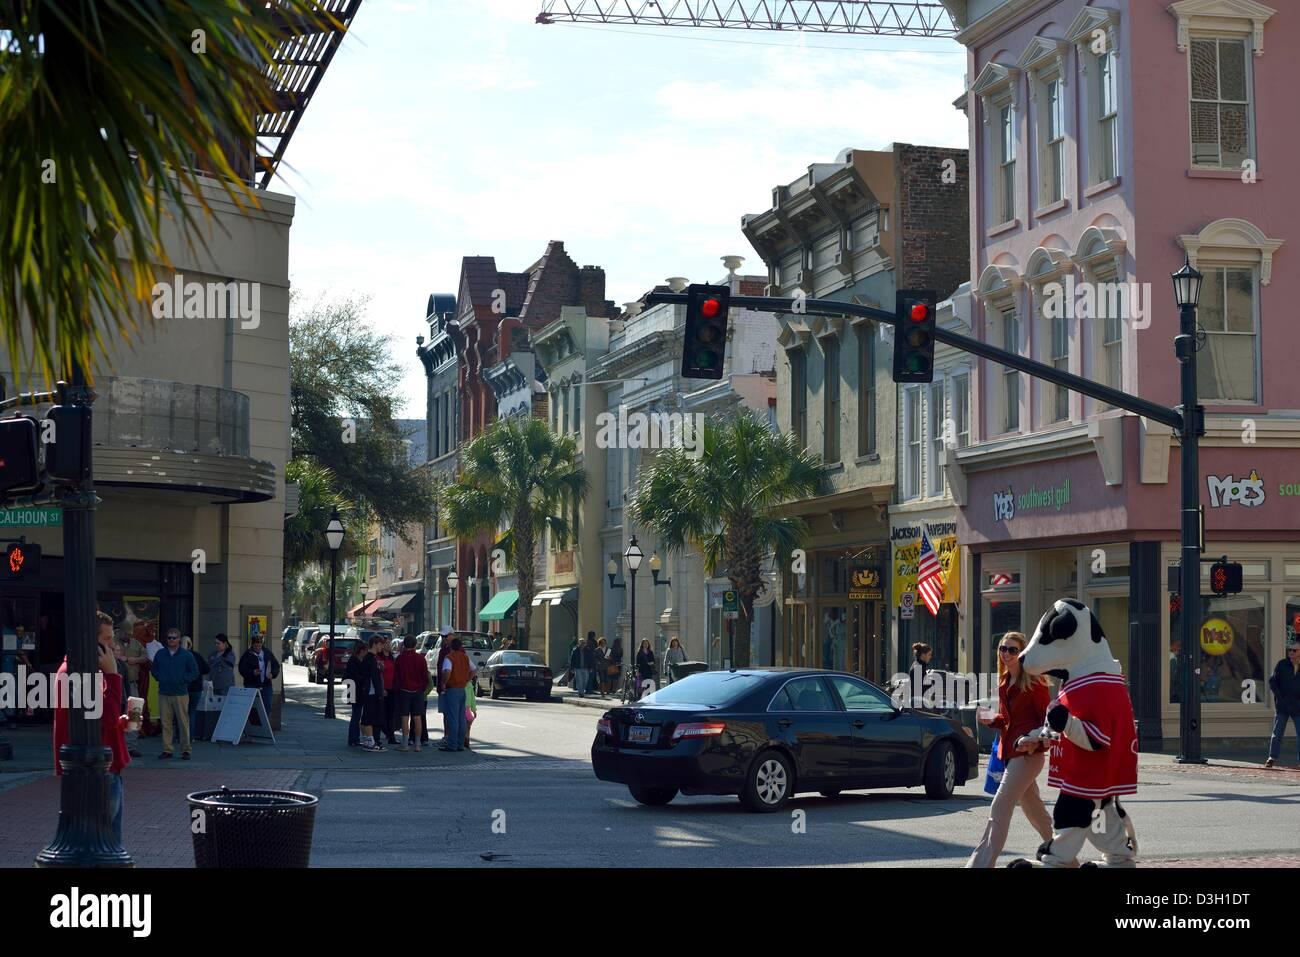 Street view at major intersection of Charleston, SC USA - Stock Image